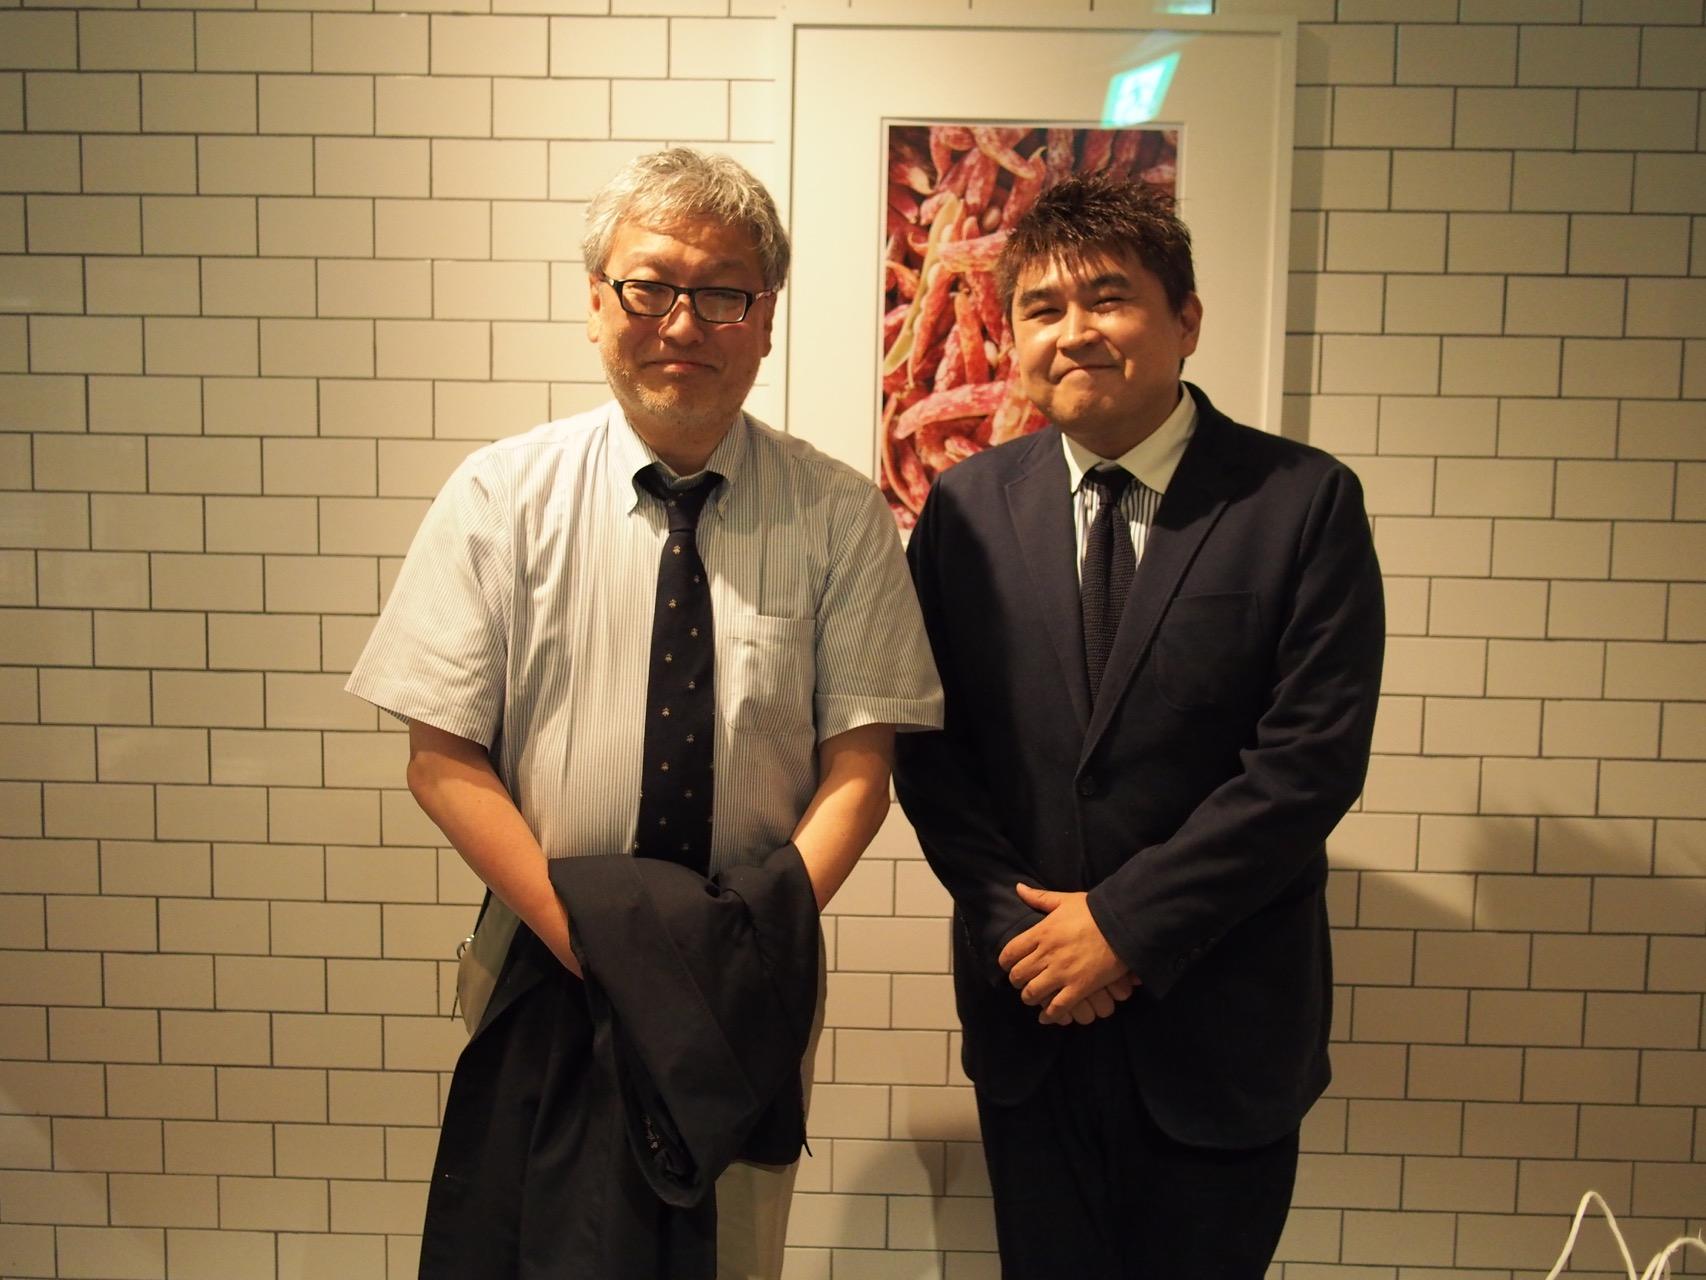 http://www.machikado-creative.jp/wordpress/wp-content/uploads/2017/08/dd8b58ec353cf32135448e37988603f2.jpg